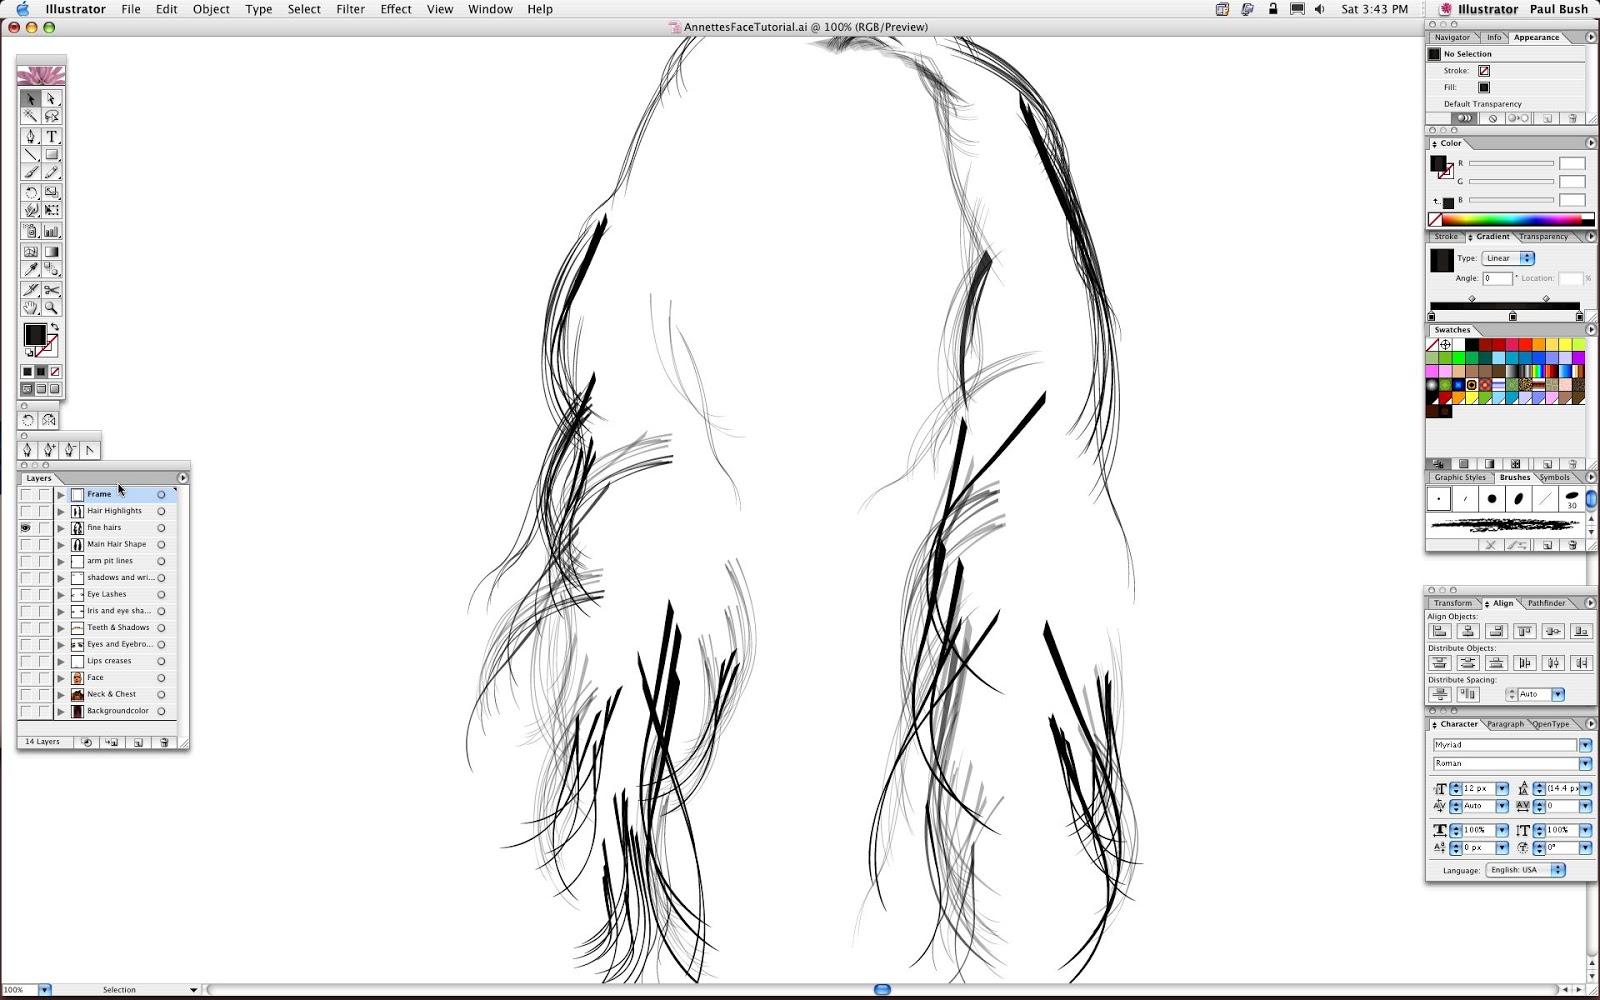 adobe illustrator cs6 full version